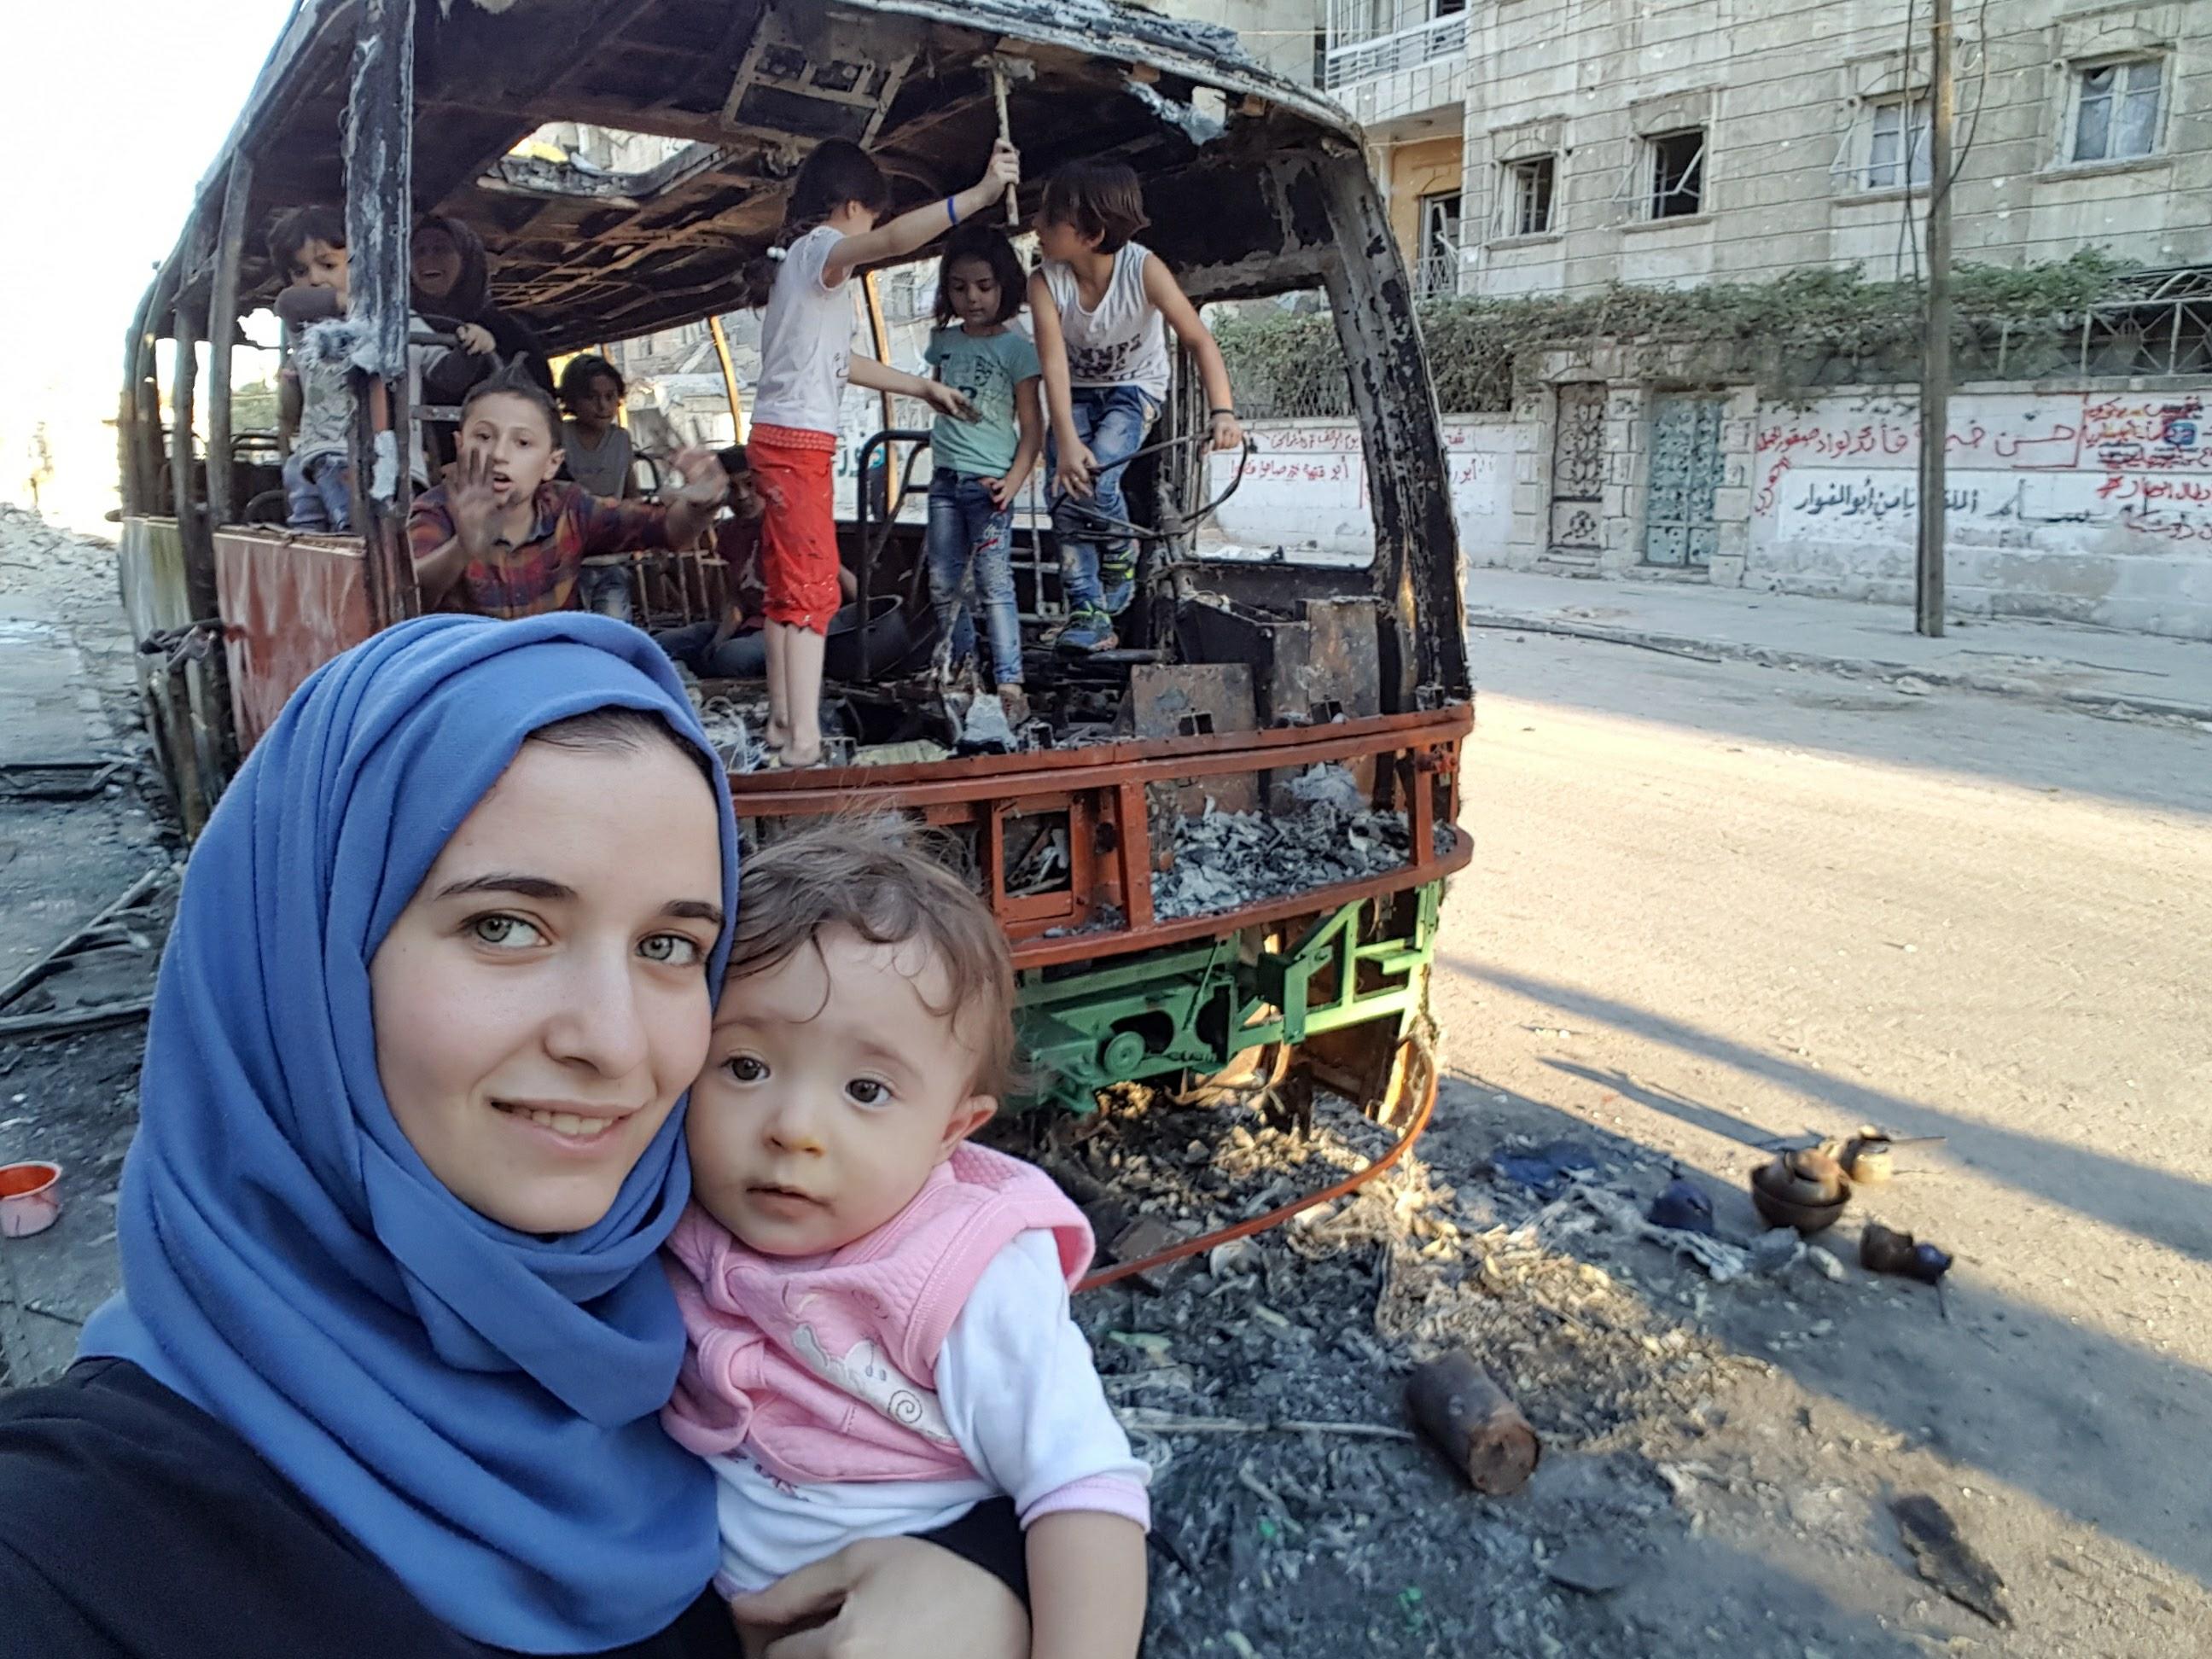 For Sama': Capturing life in Aleppo under siege - CNN Video